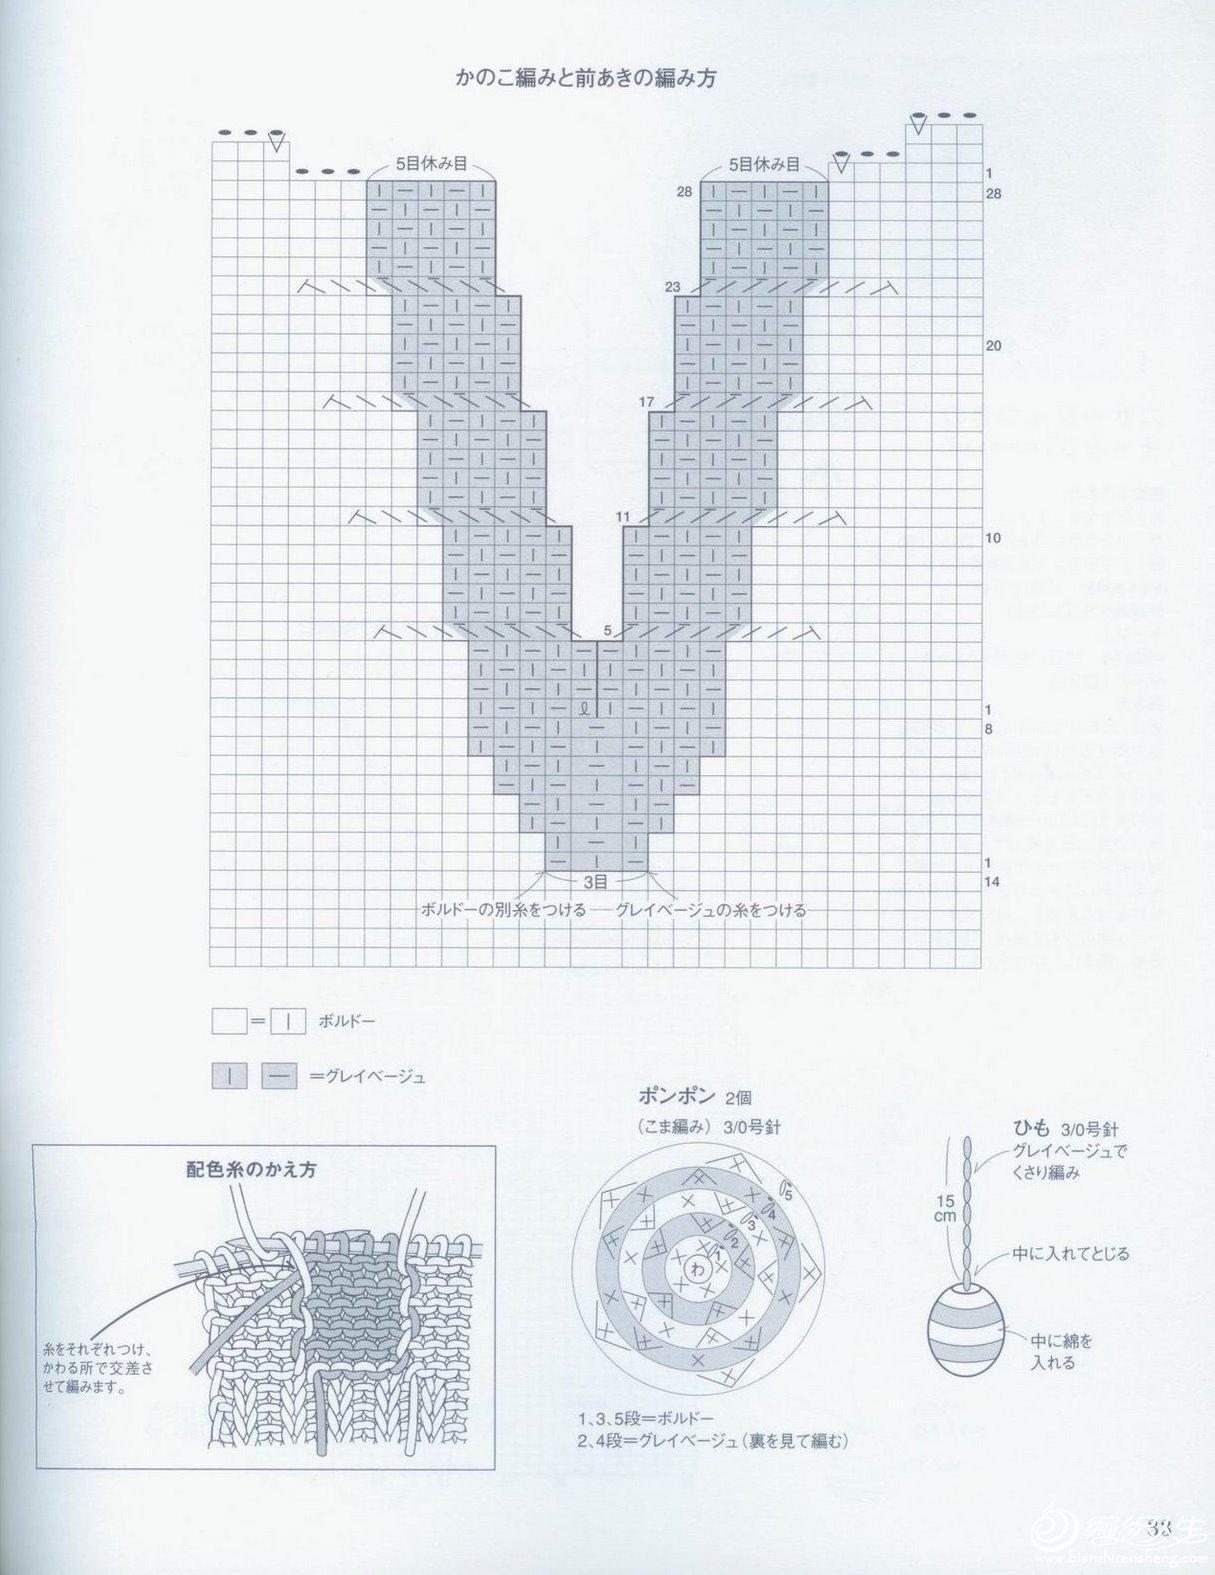 h033.jpg